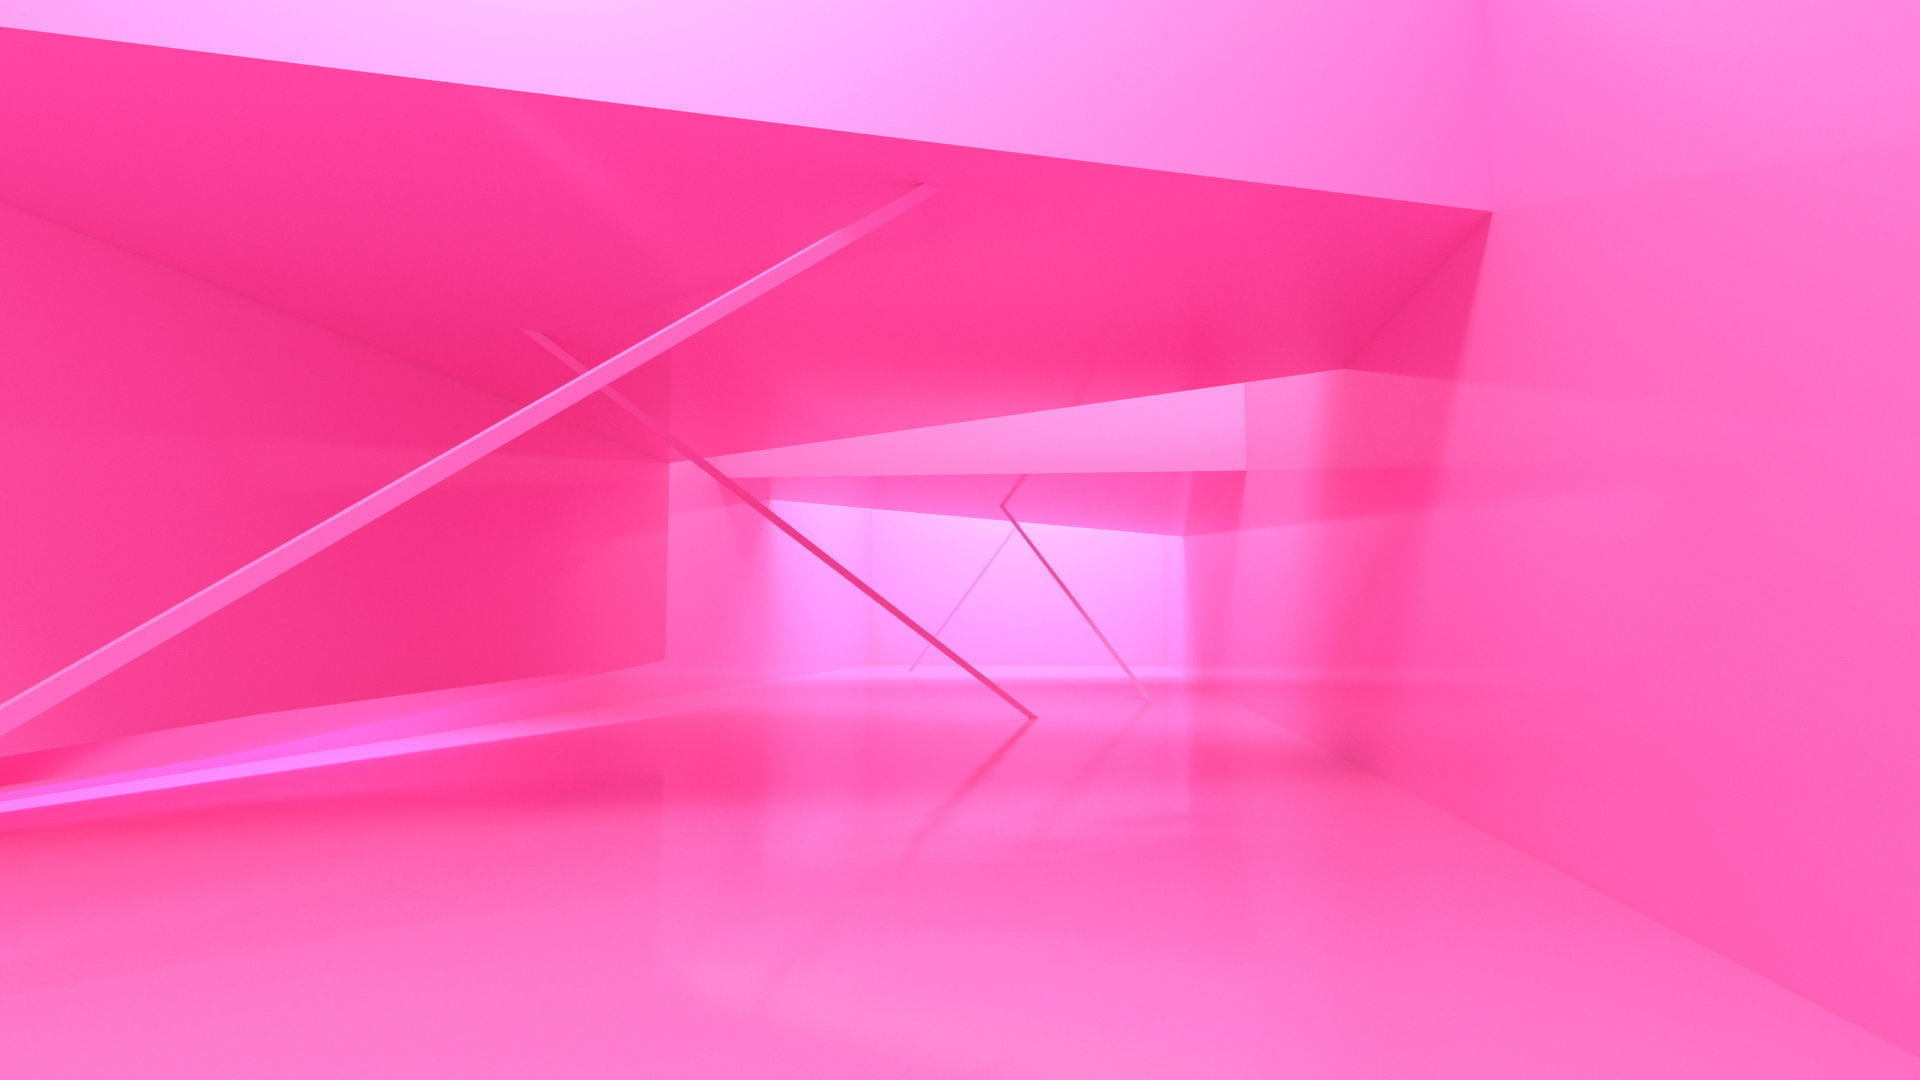 Pink background pictures for 3d room color design